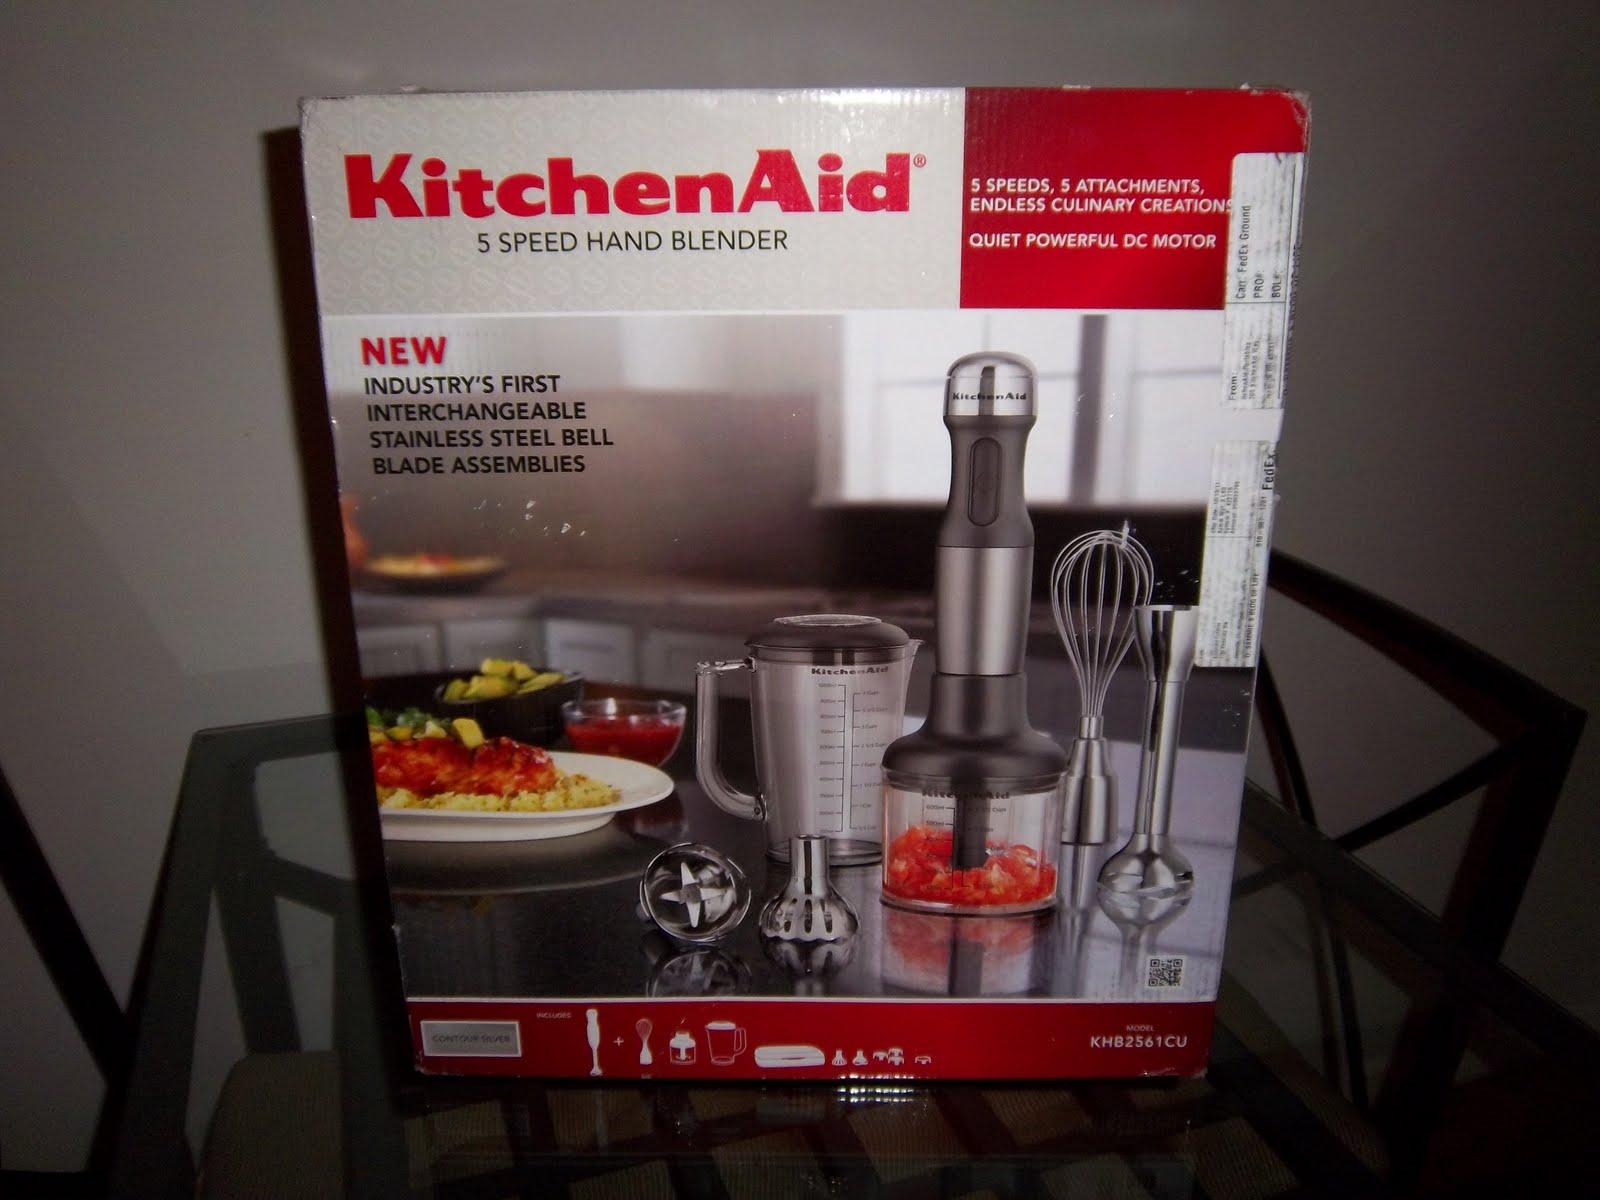 Kitchen Aid Immersion Blender On Box